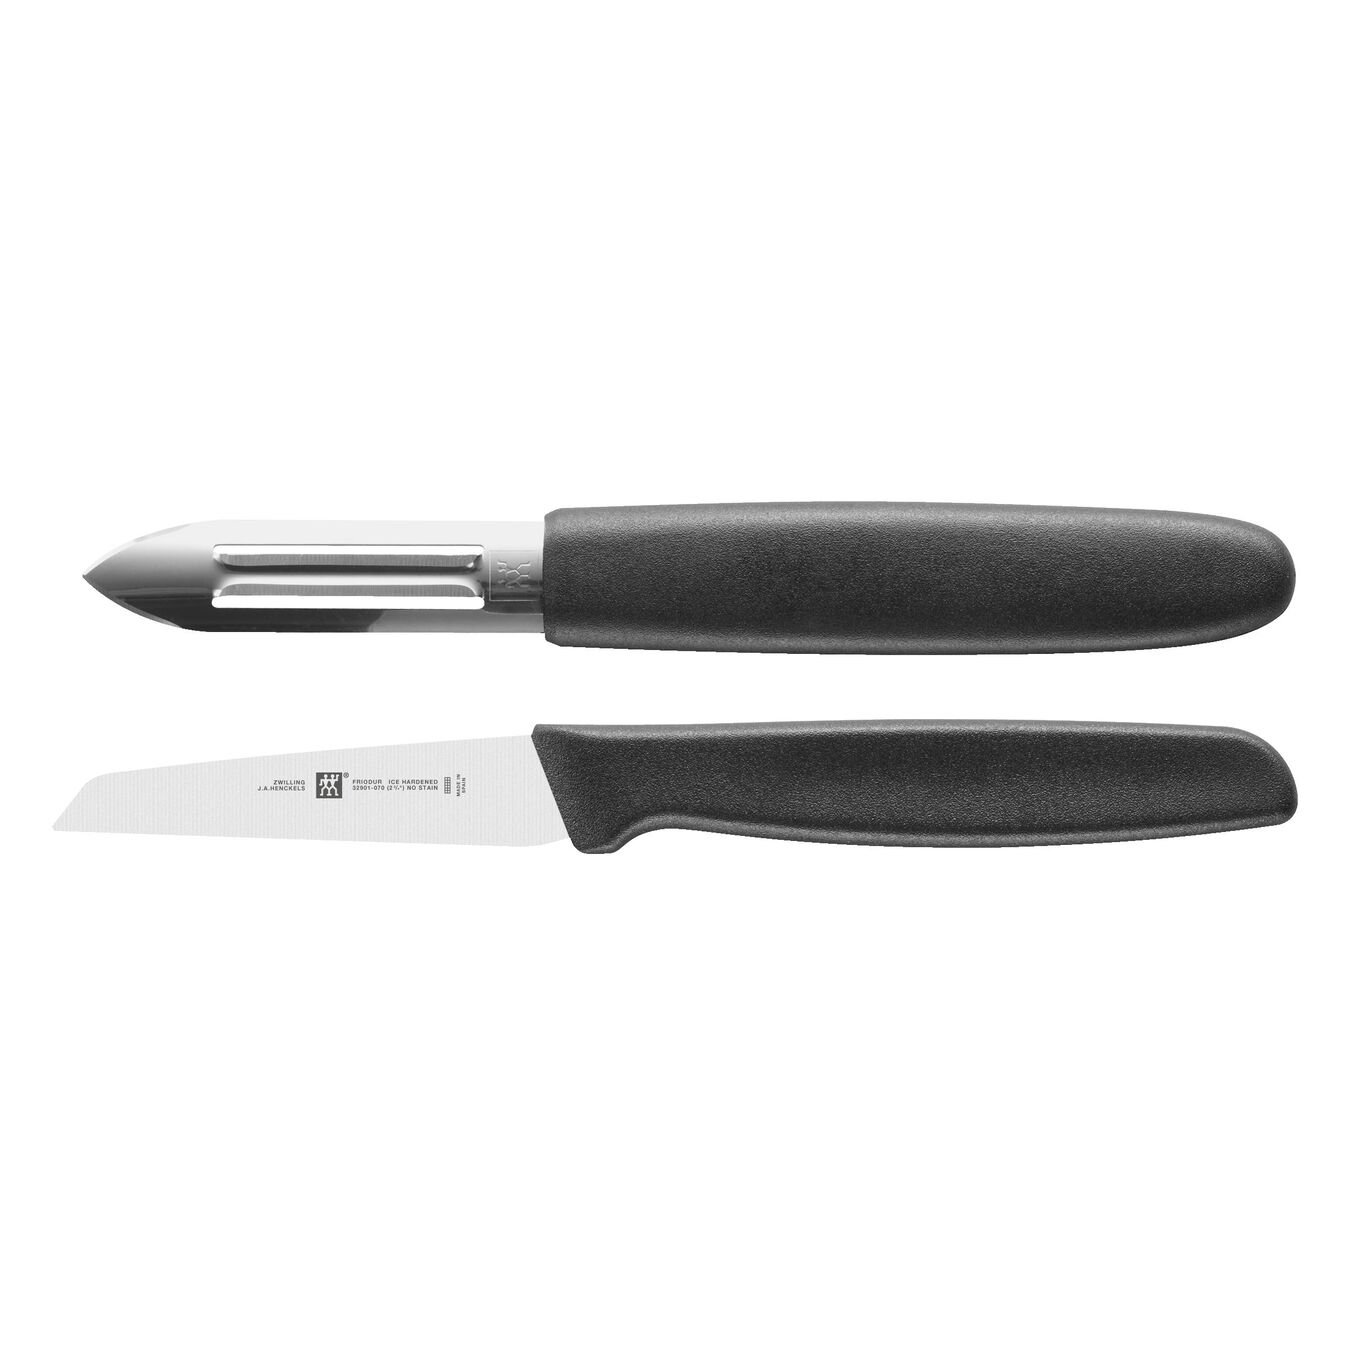 Set di coltelli - 2-pz.,,large 1